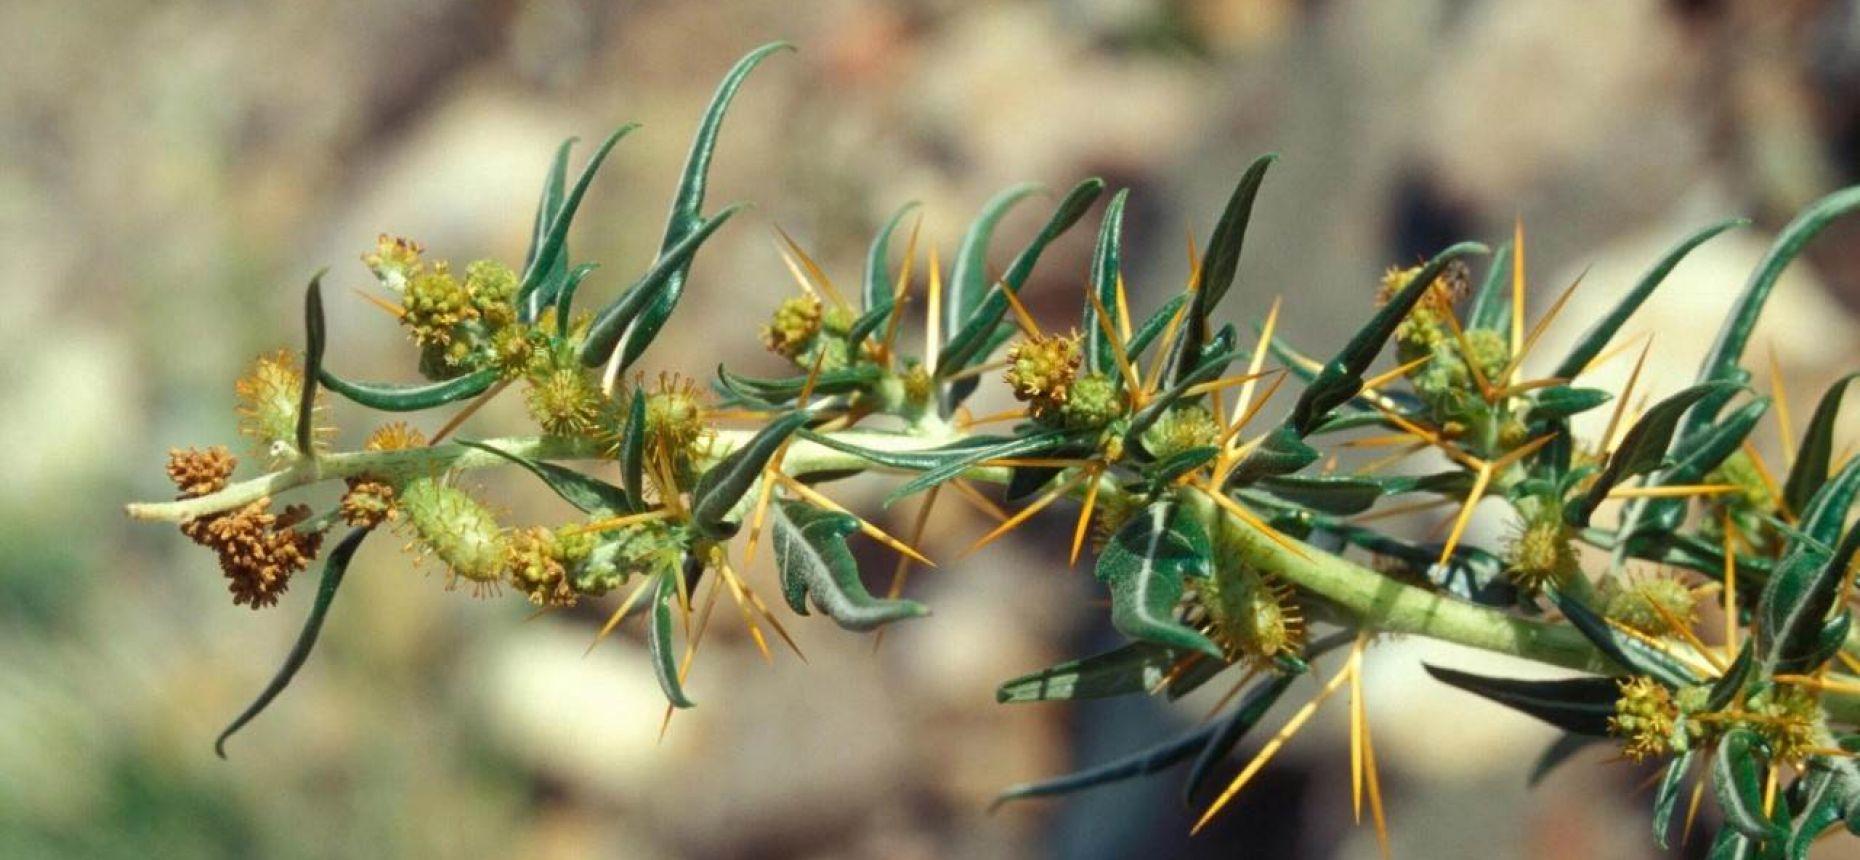 Дурнишник колючий - XanthiumspinosumL.